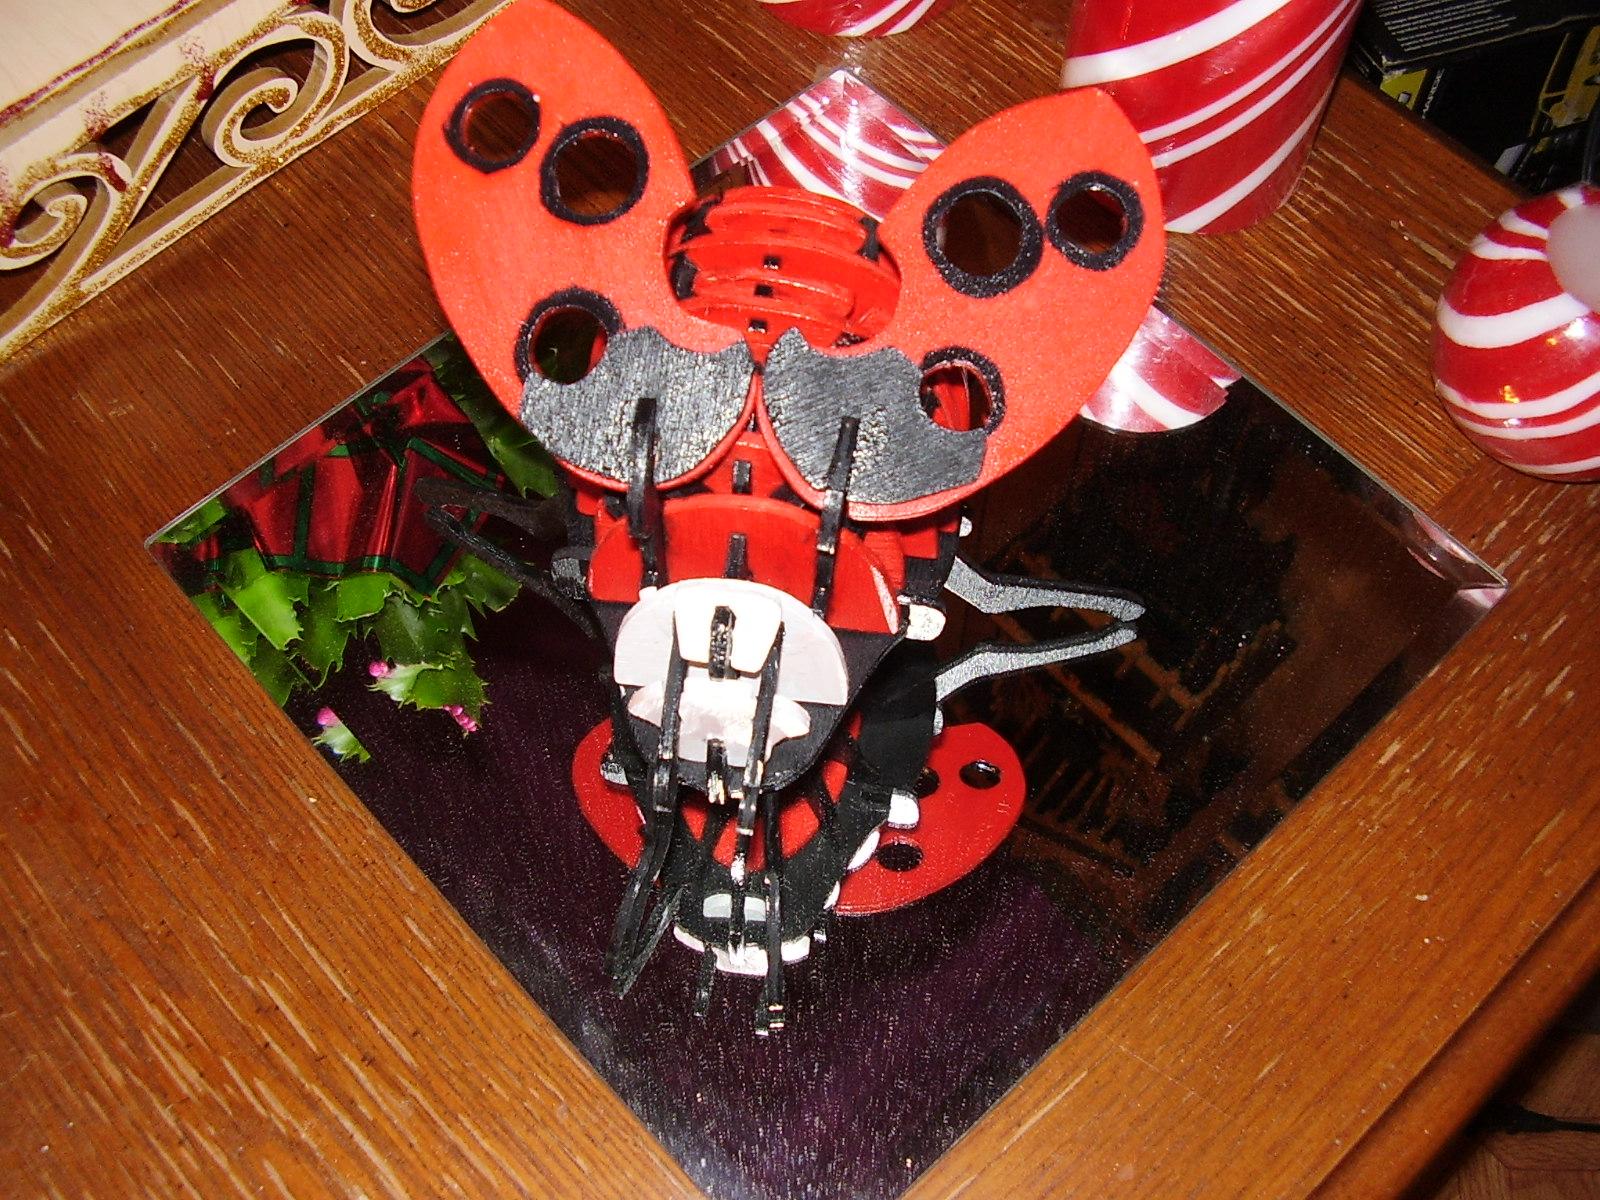 Laverne the Ladybug